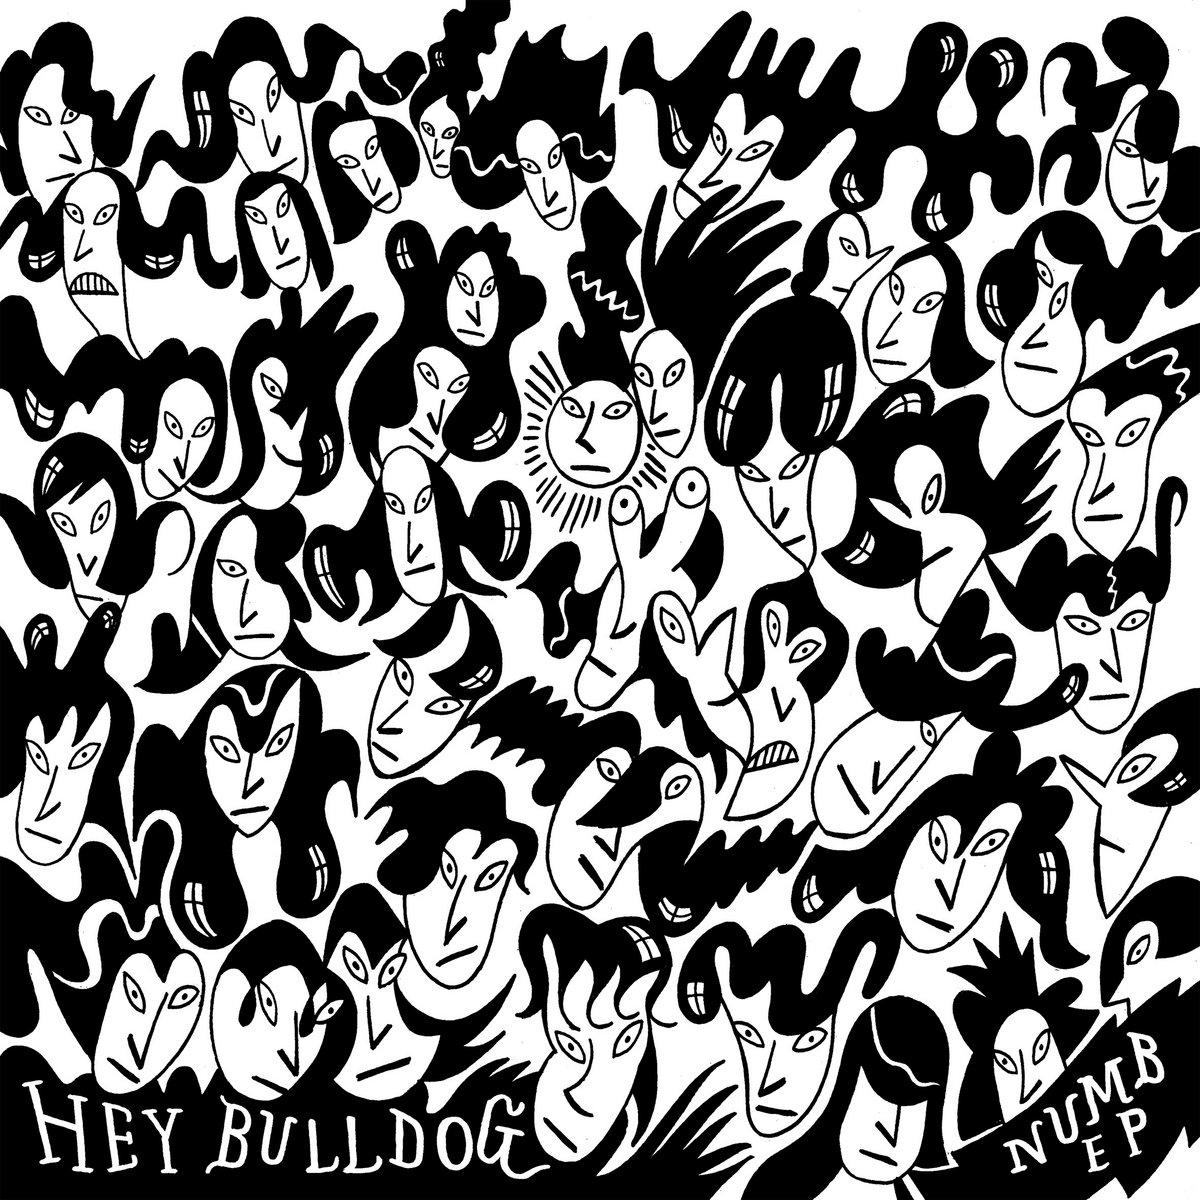 I'm Going Down | Hey Bulldog